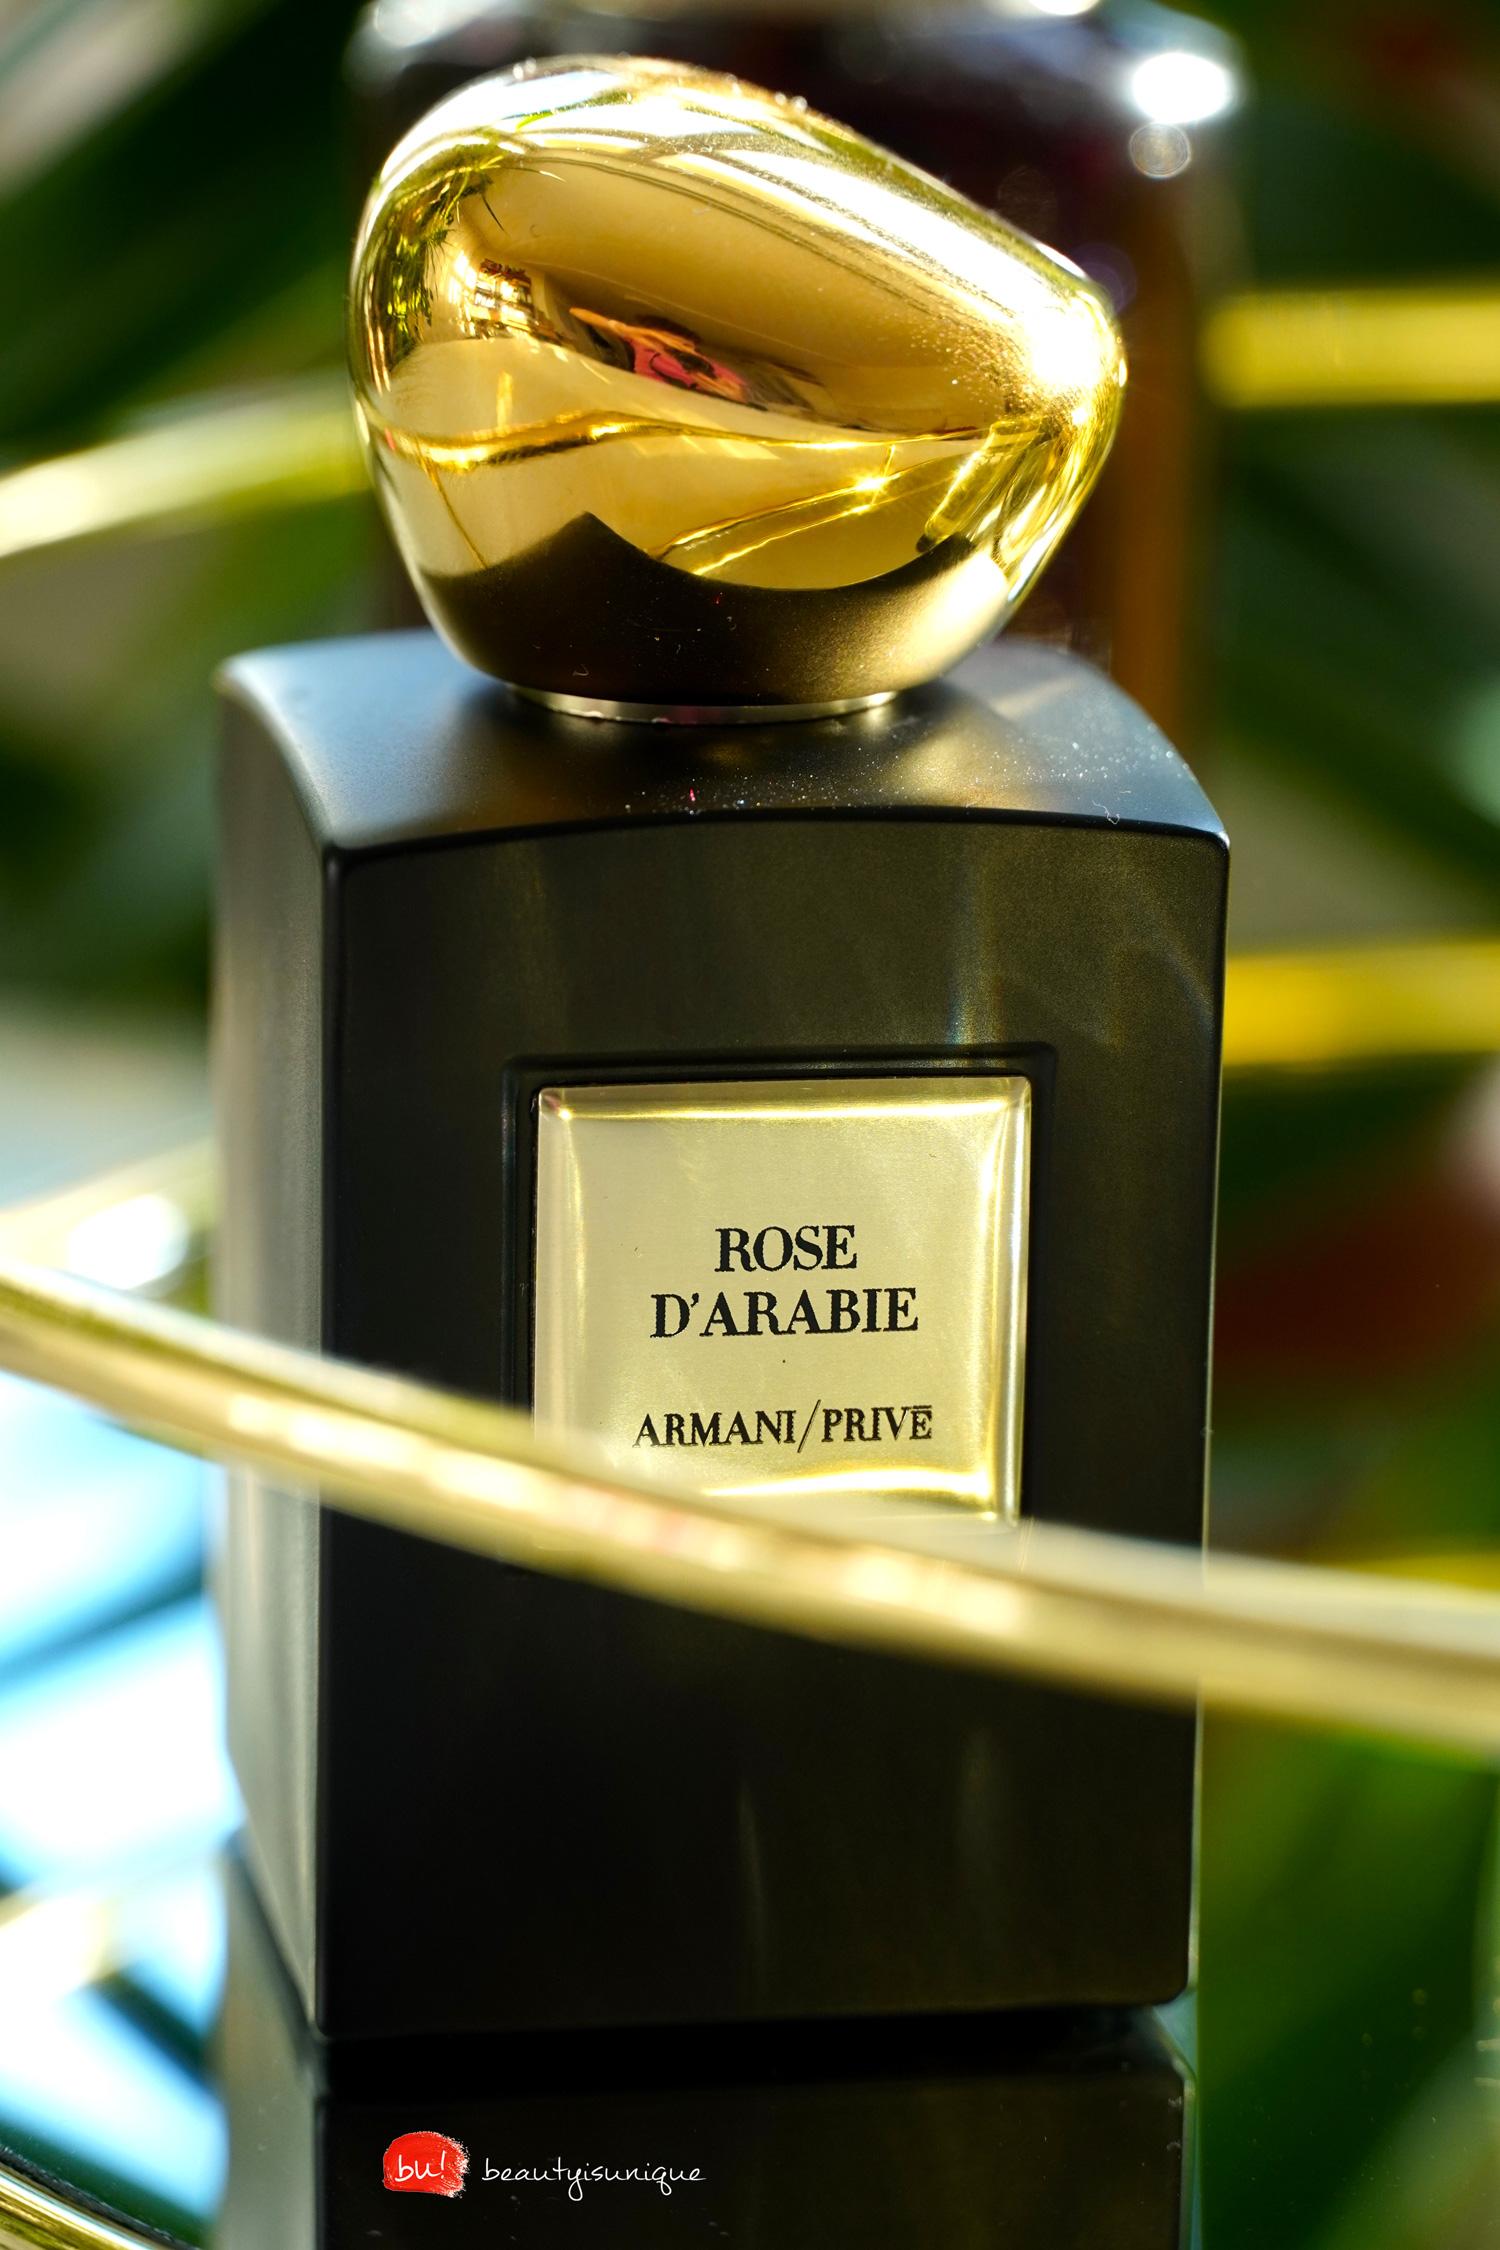 Armani-prive-rose-d'arabie-parfum